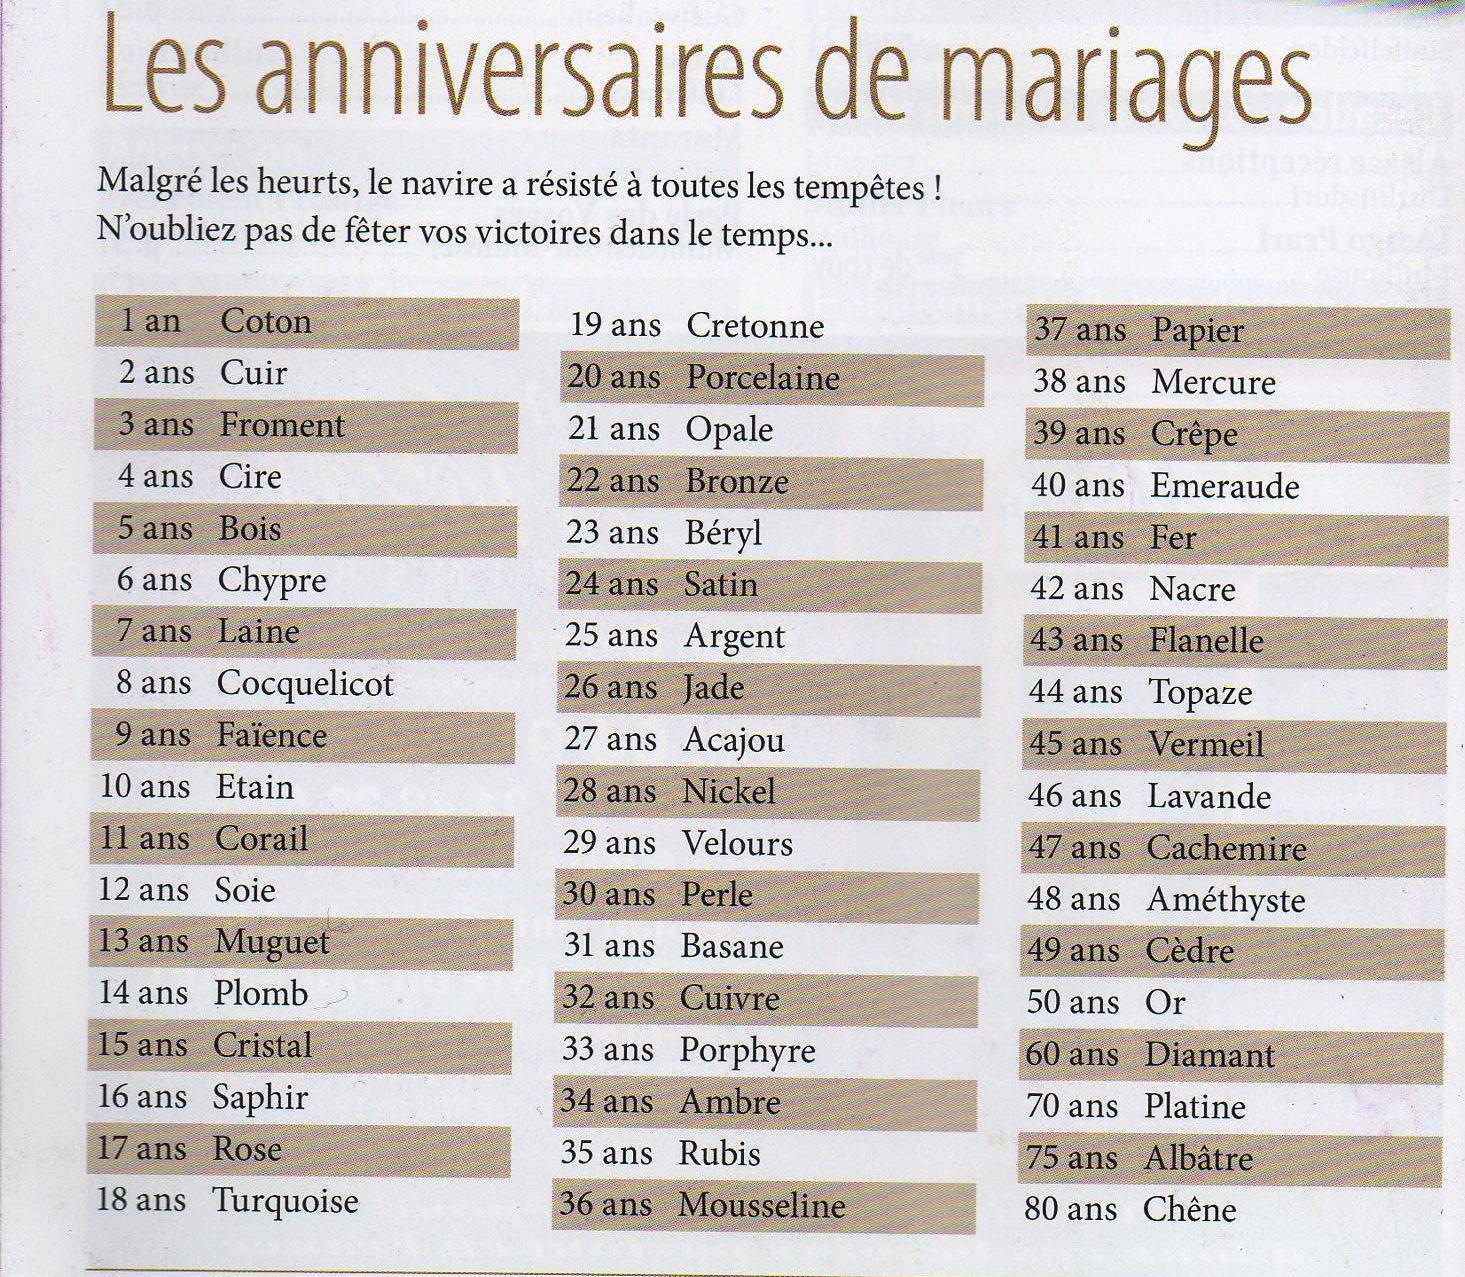 Tindomerel mai 2012 - 65 ans de mariage noce de quoi ...